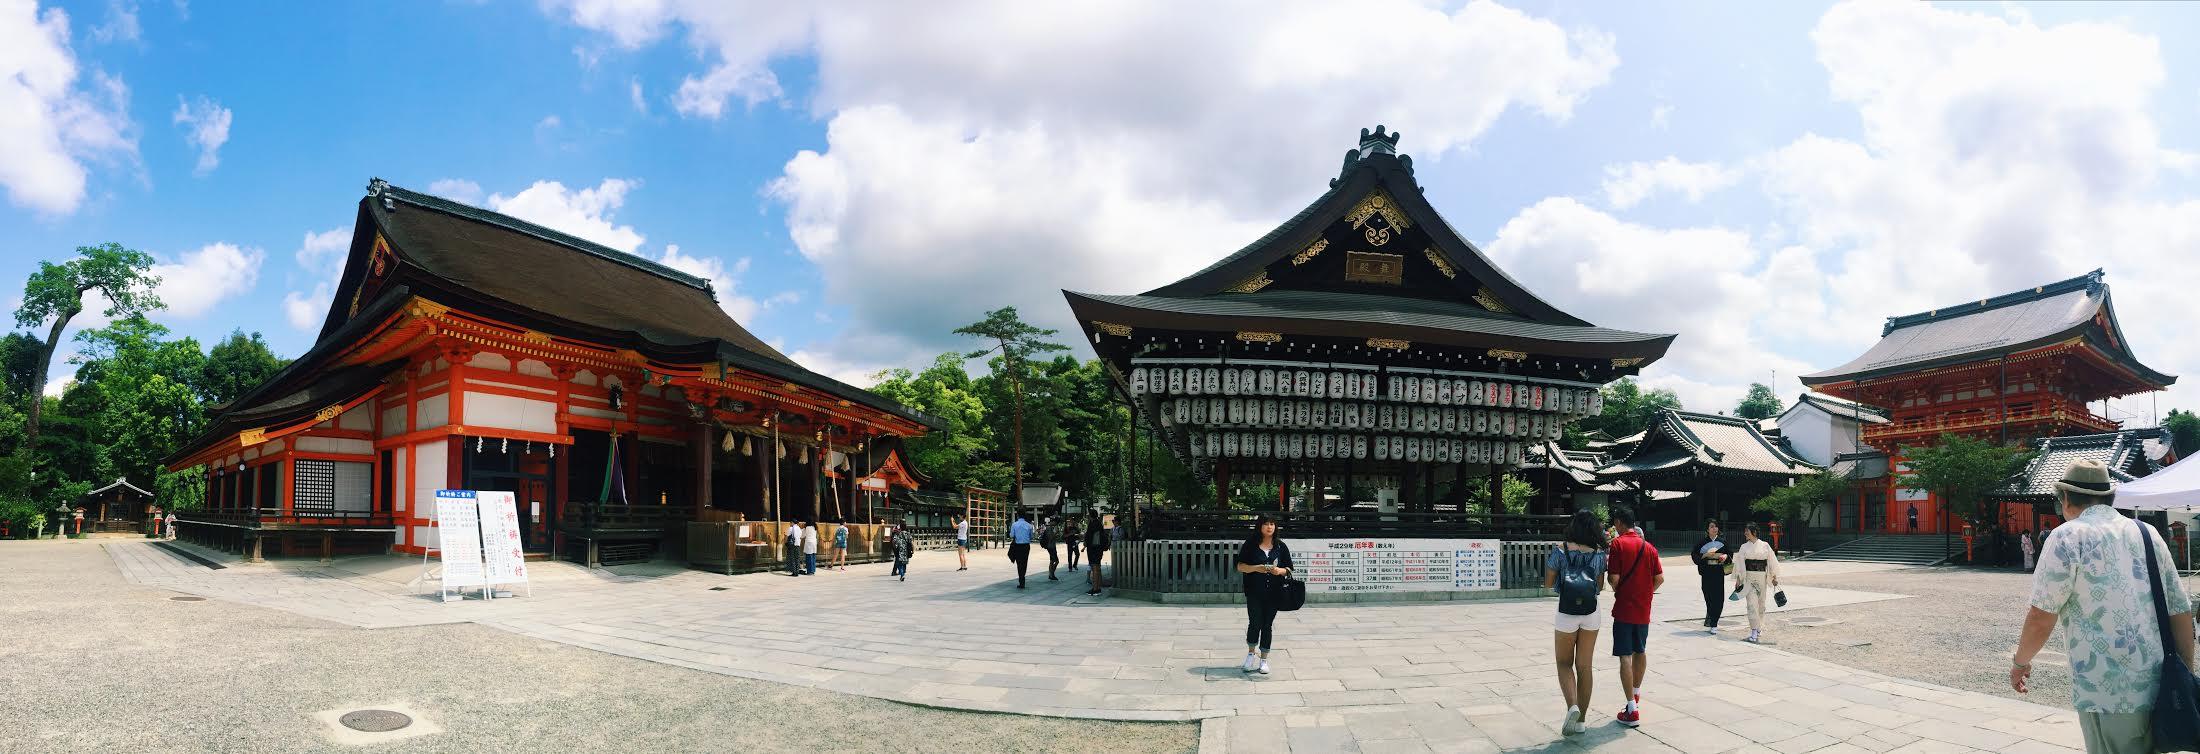 Muslim-travel-tips-Kyoto-Yasaka-Shrine-panorama.jpg